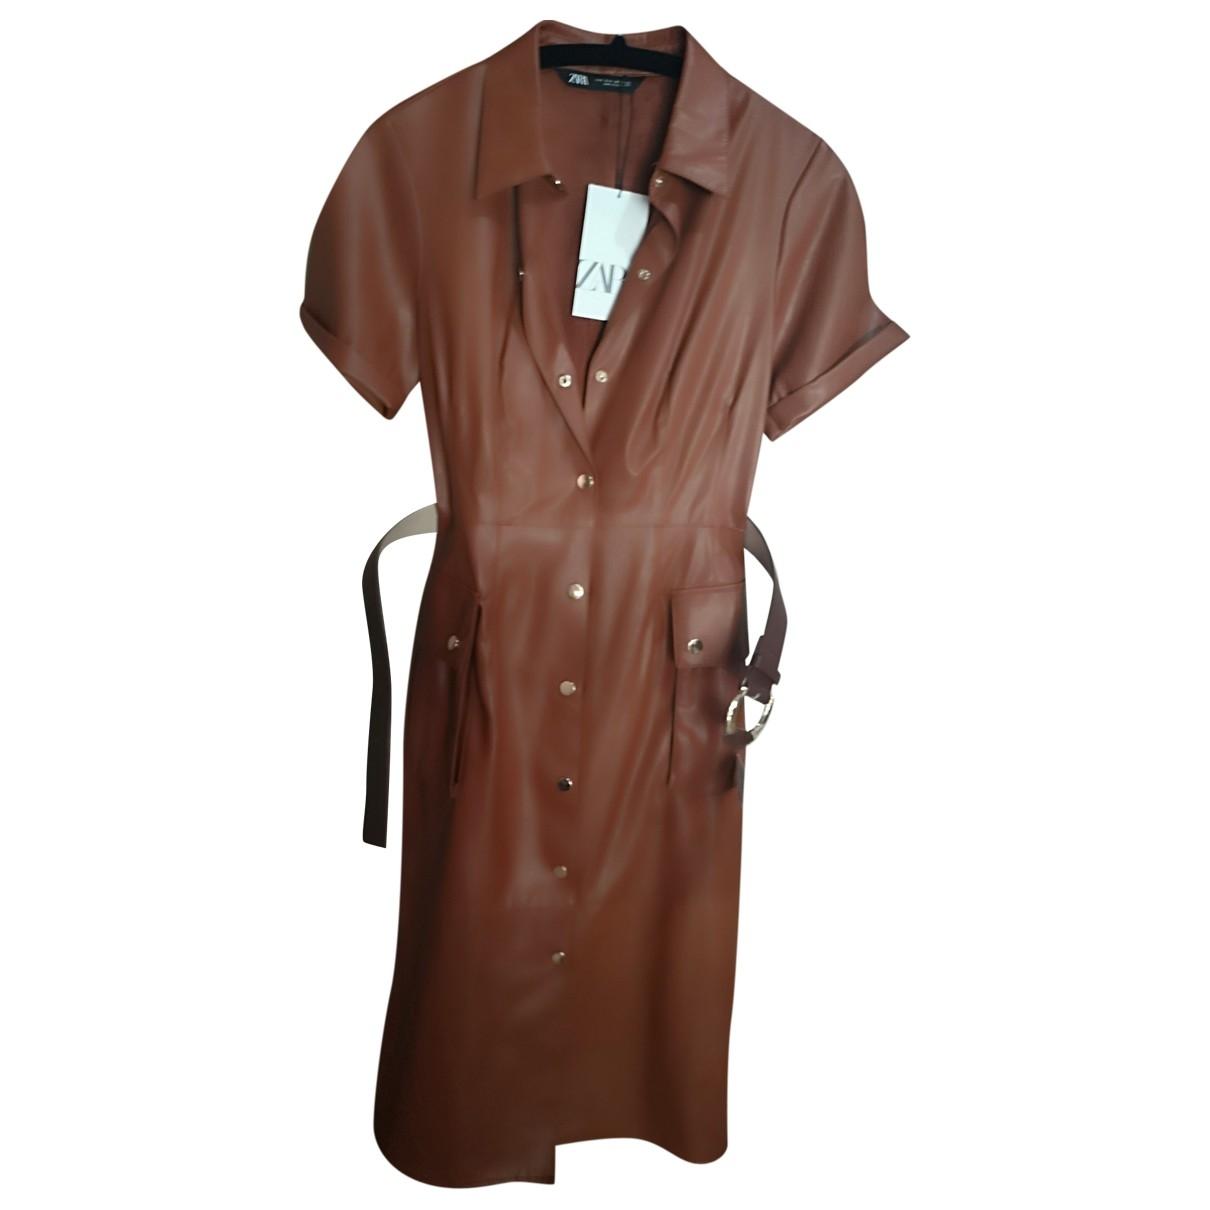 Zara \N Brown Leather dress for Women S International